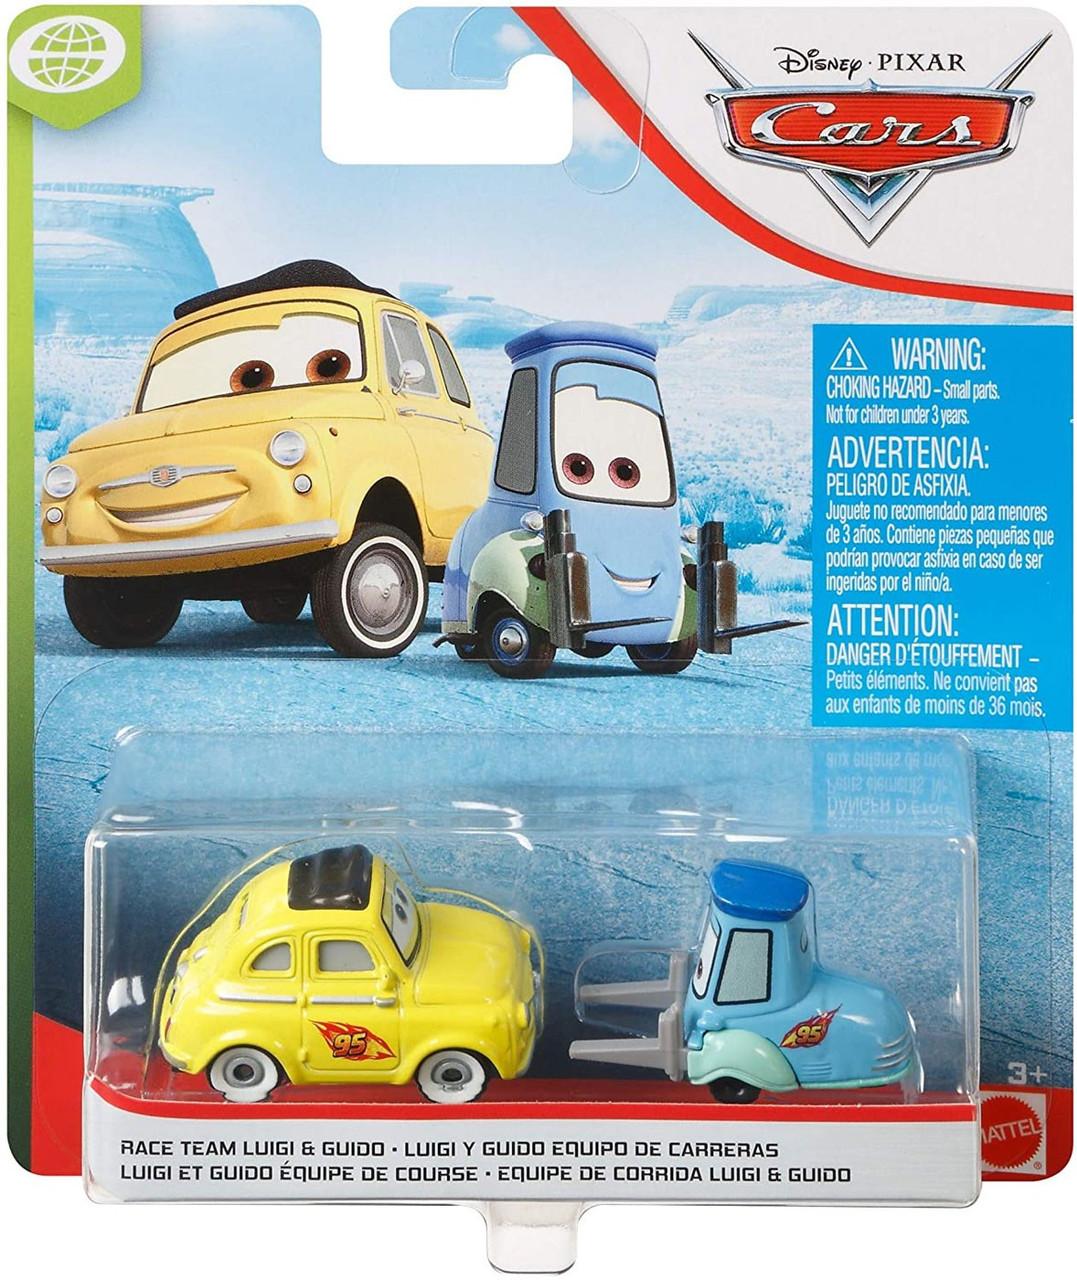 Disney Pixar Cars Luigi Guido Vehicles